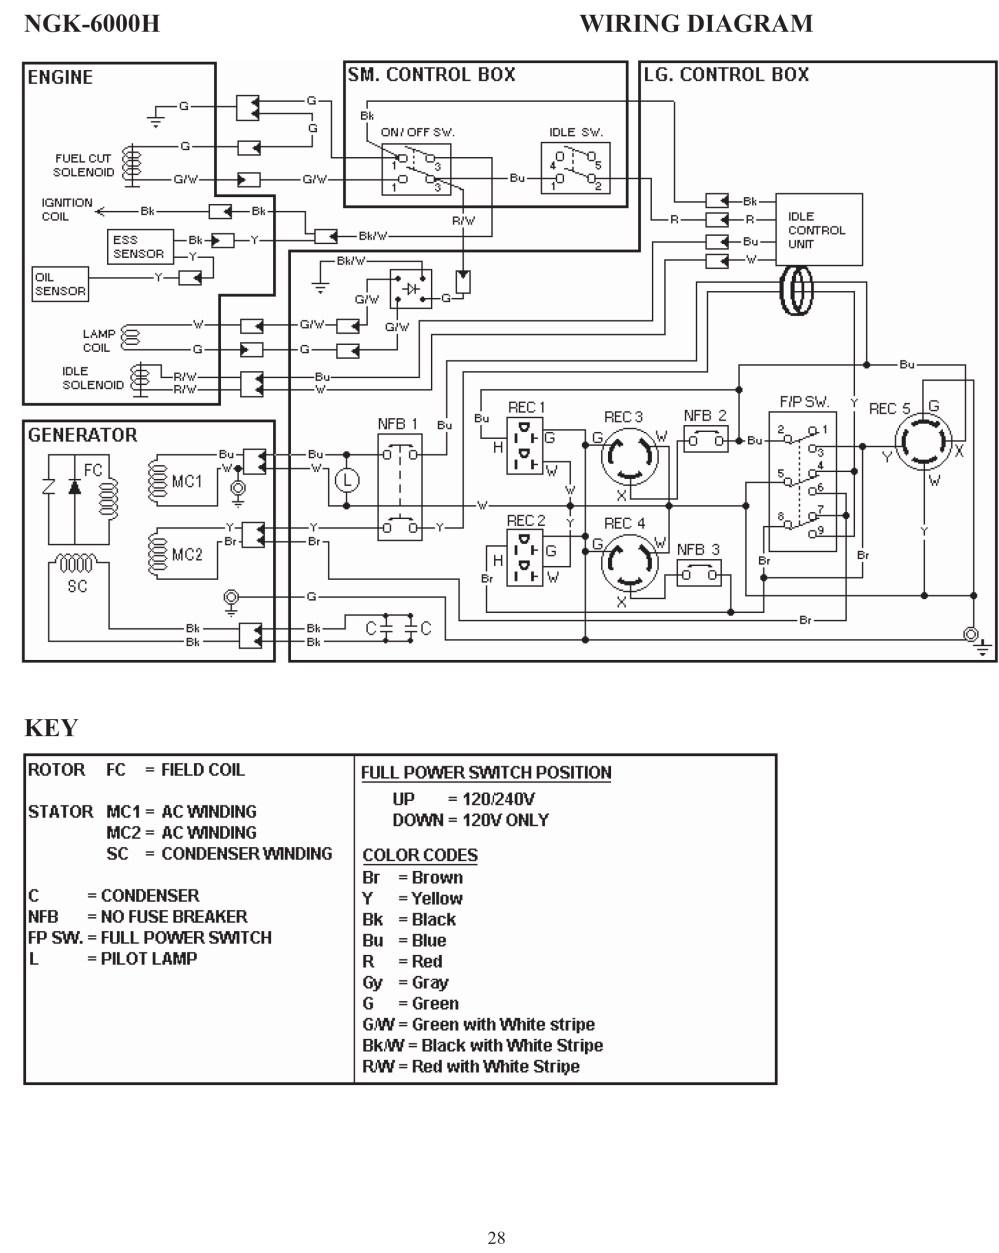 medium resolution of winnebago wiring diagrams bdm wiring schematic diagramwinnebago wiring diagram wiring diagram today winnebago ac wiring diagram